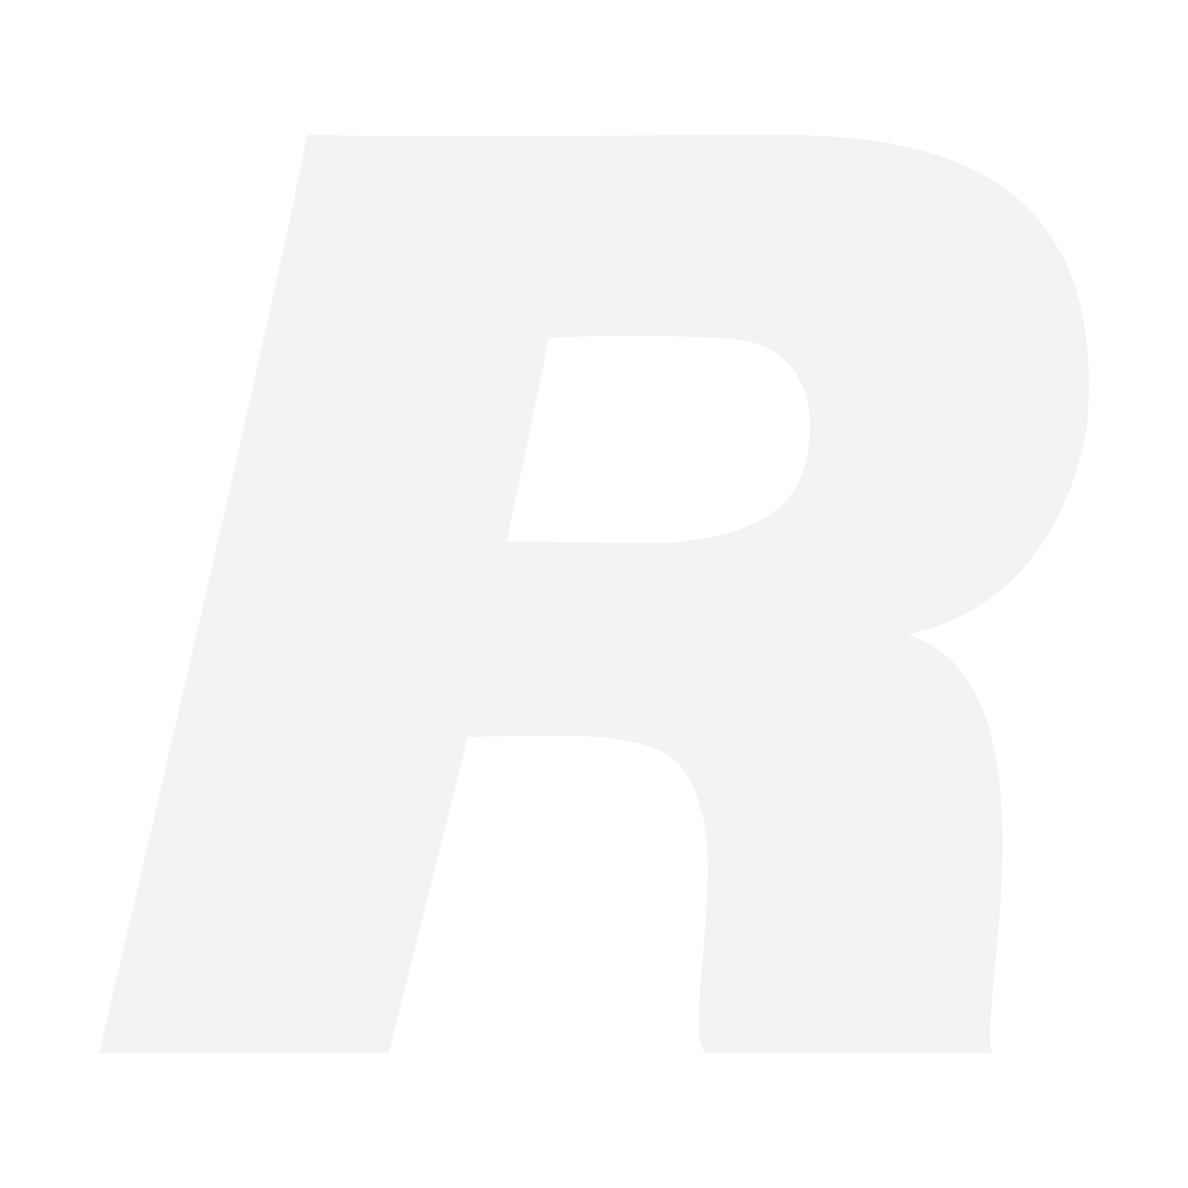 Elinchrom E26111 Rotalux Rotagrid 90x110cm (for E26176)